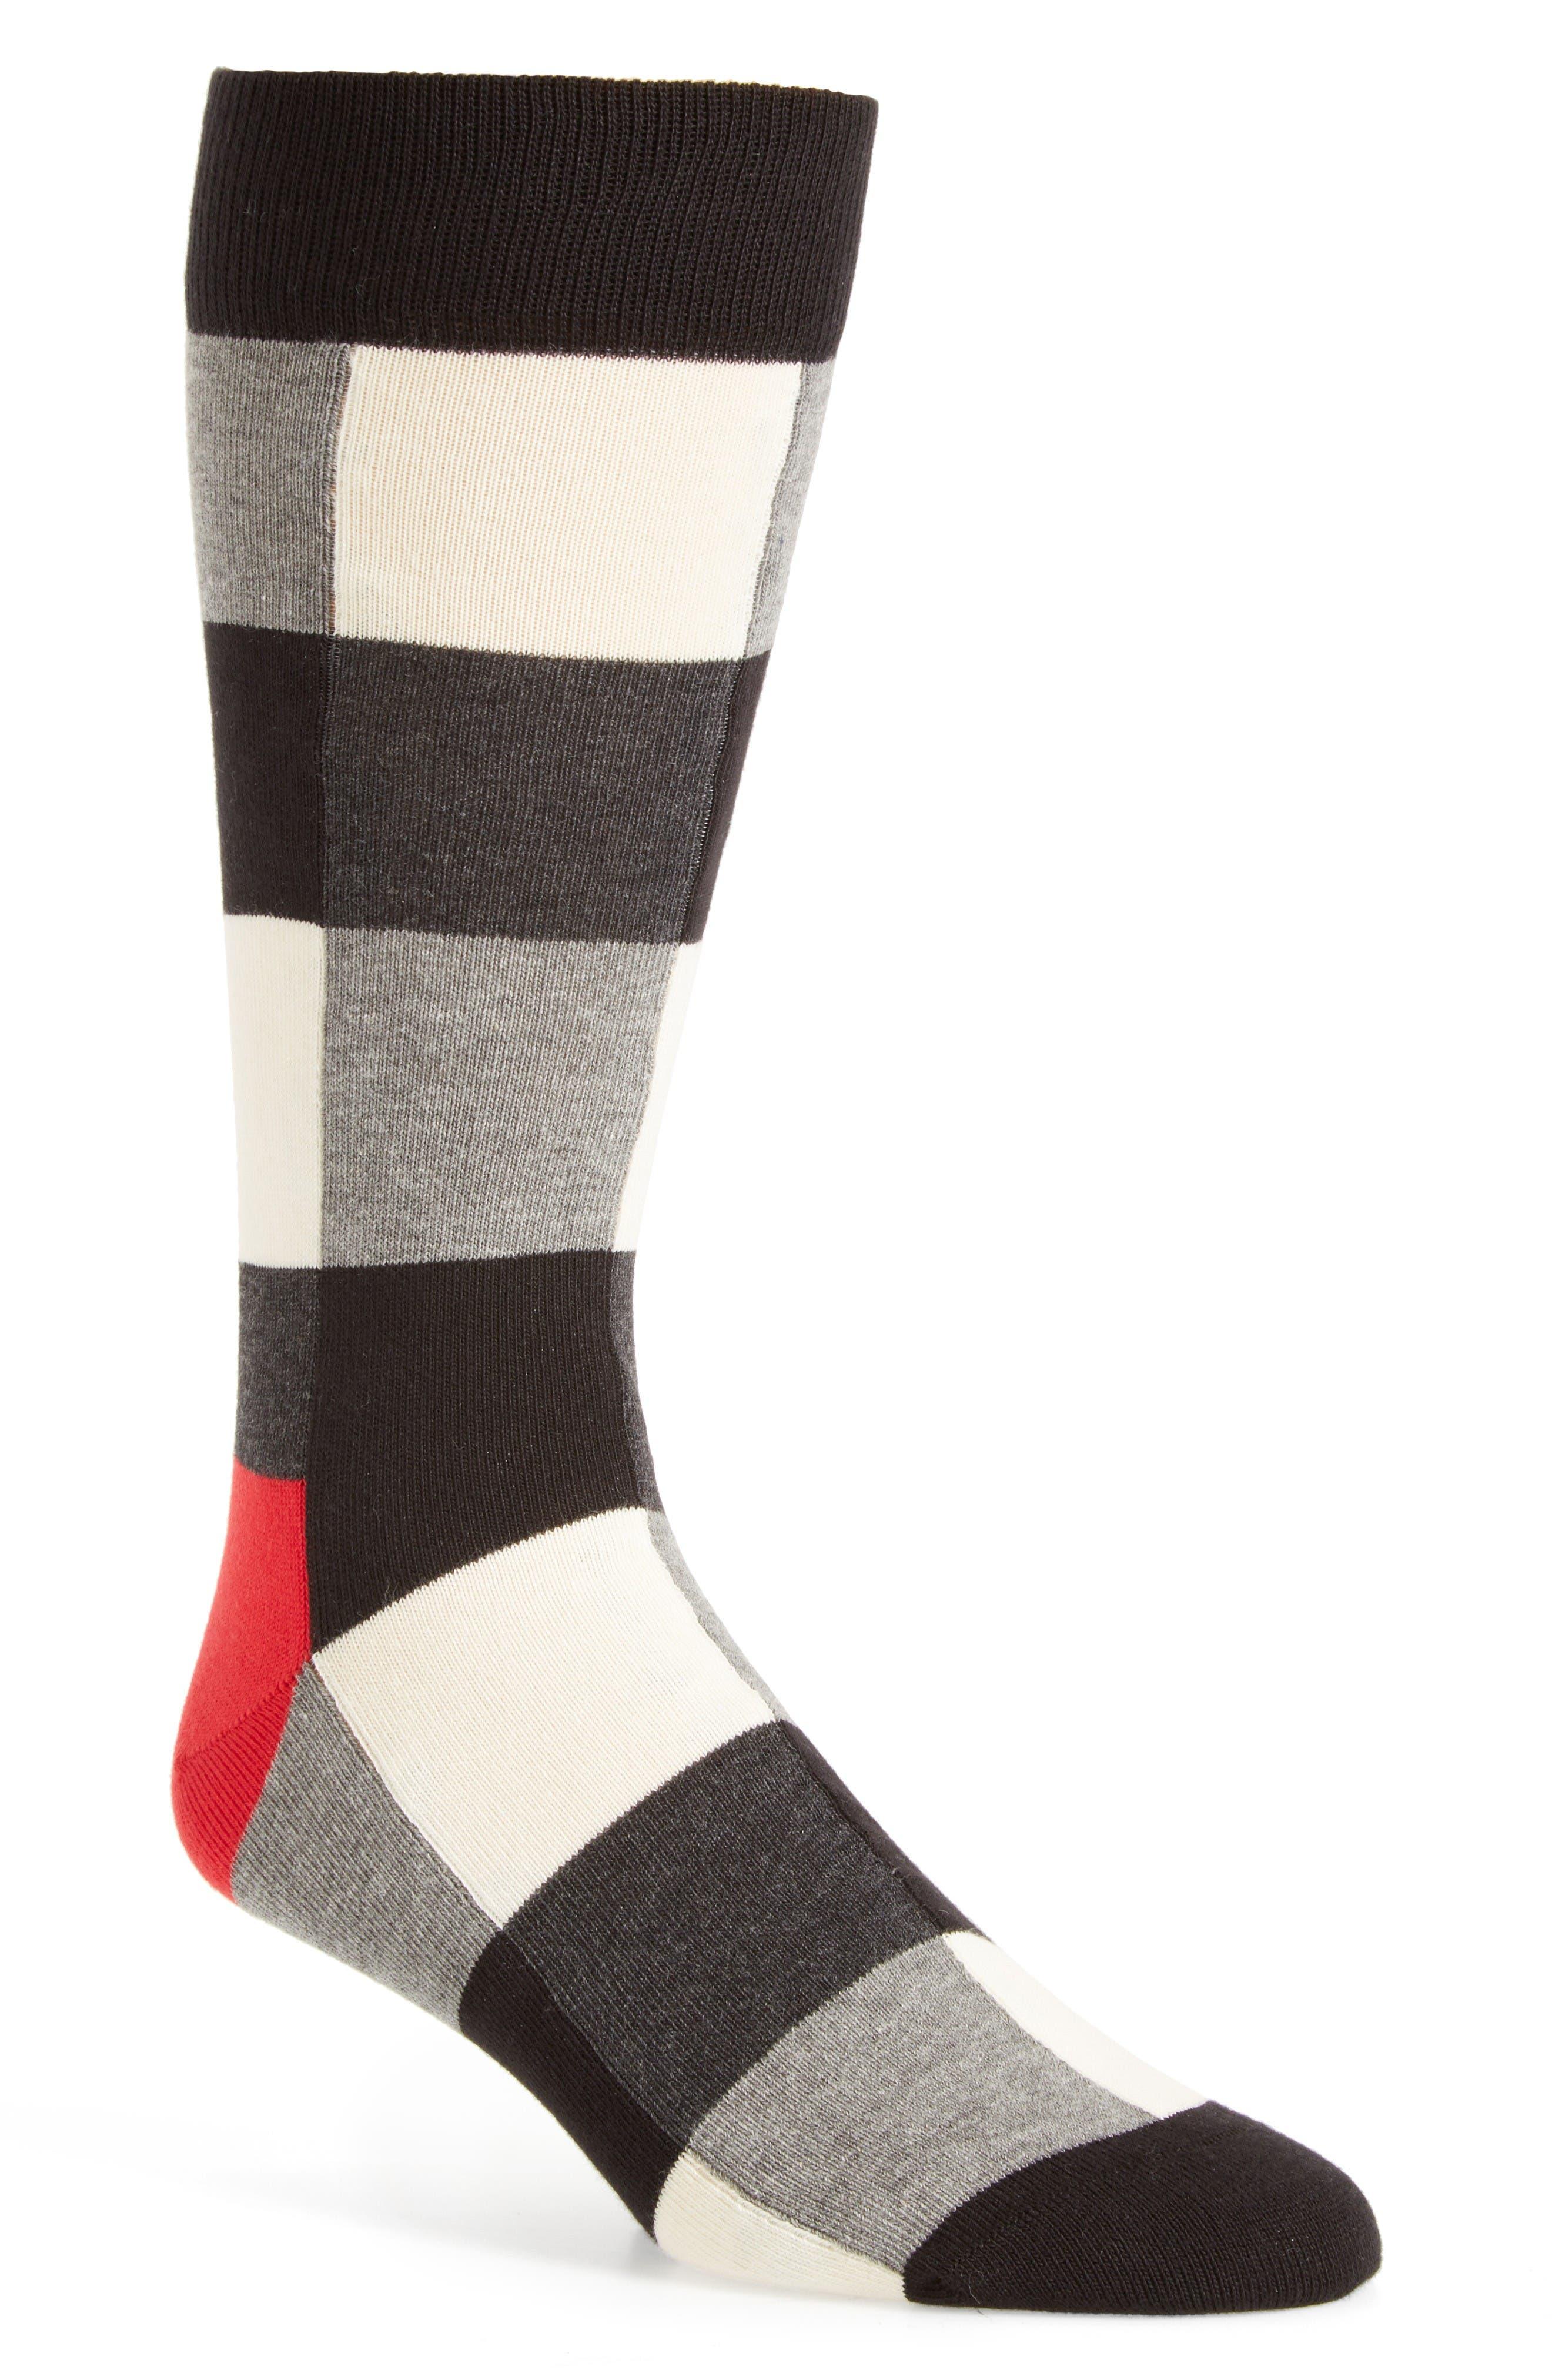 Alternate Image 1 Selected - Happy Socks Check Socks (3 for $30)